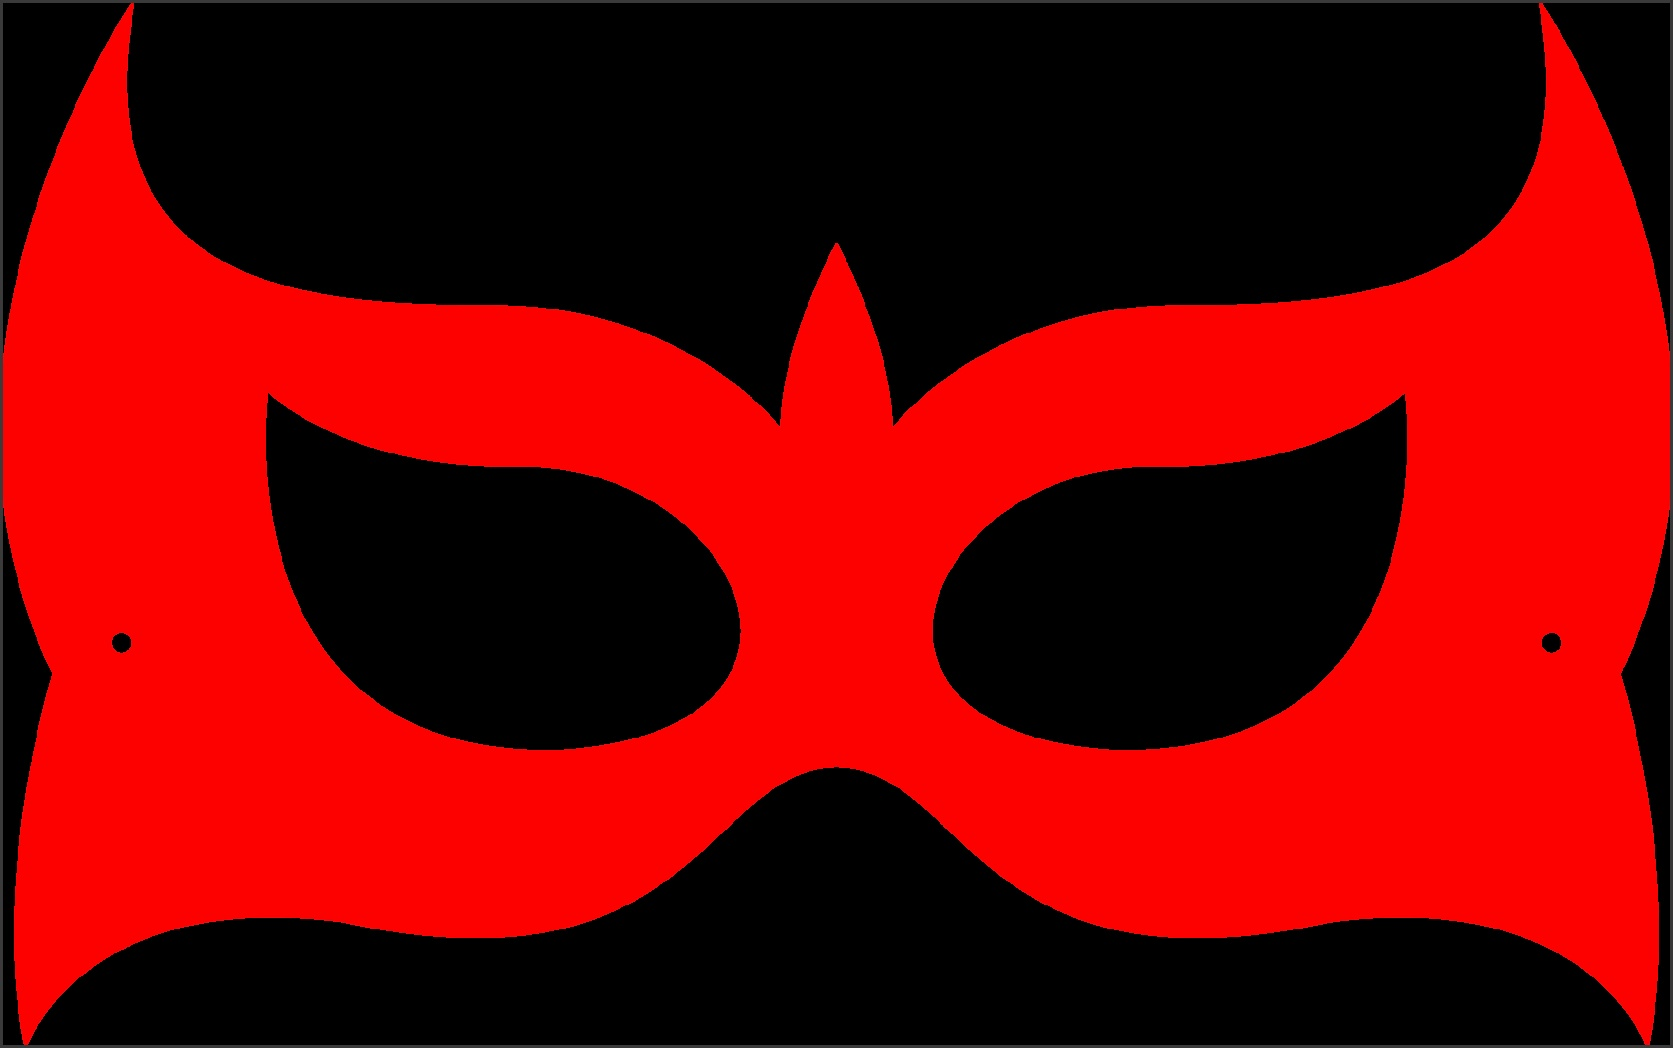 xprintable superhero mask firestar 2 gespeed ic O6uX1WovmT